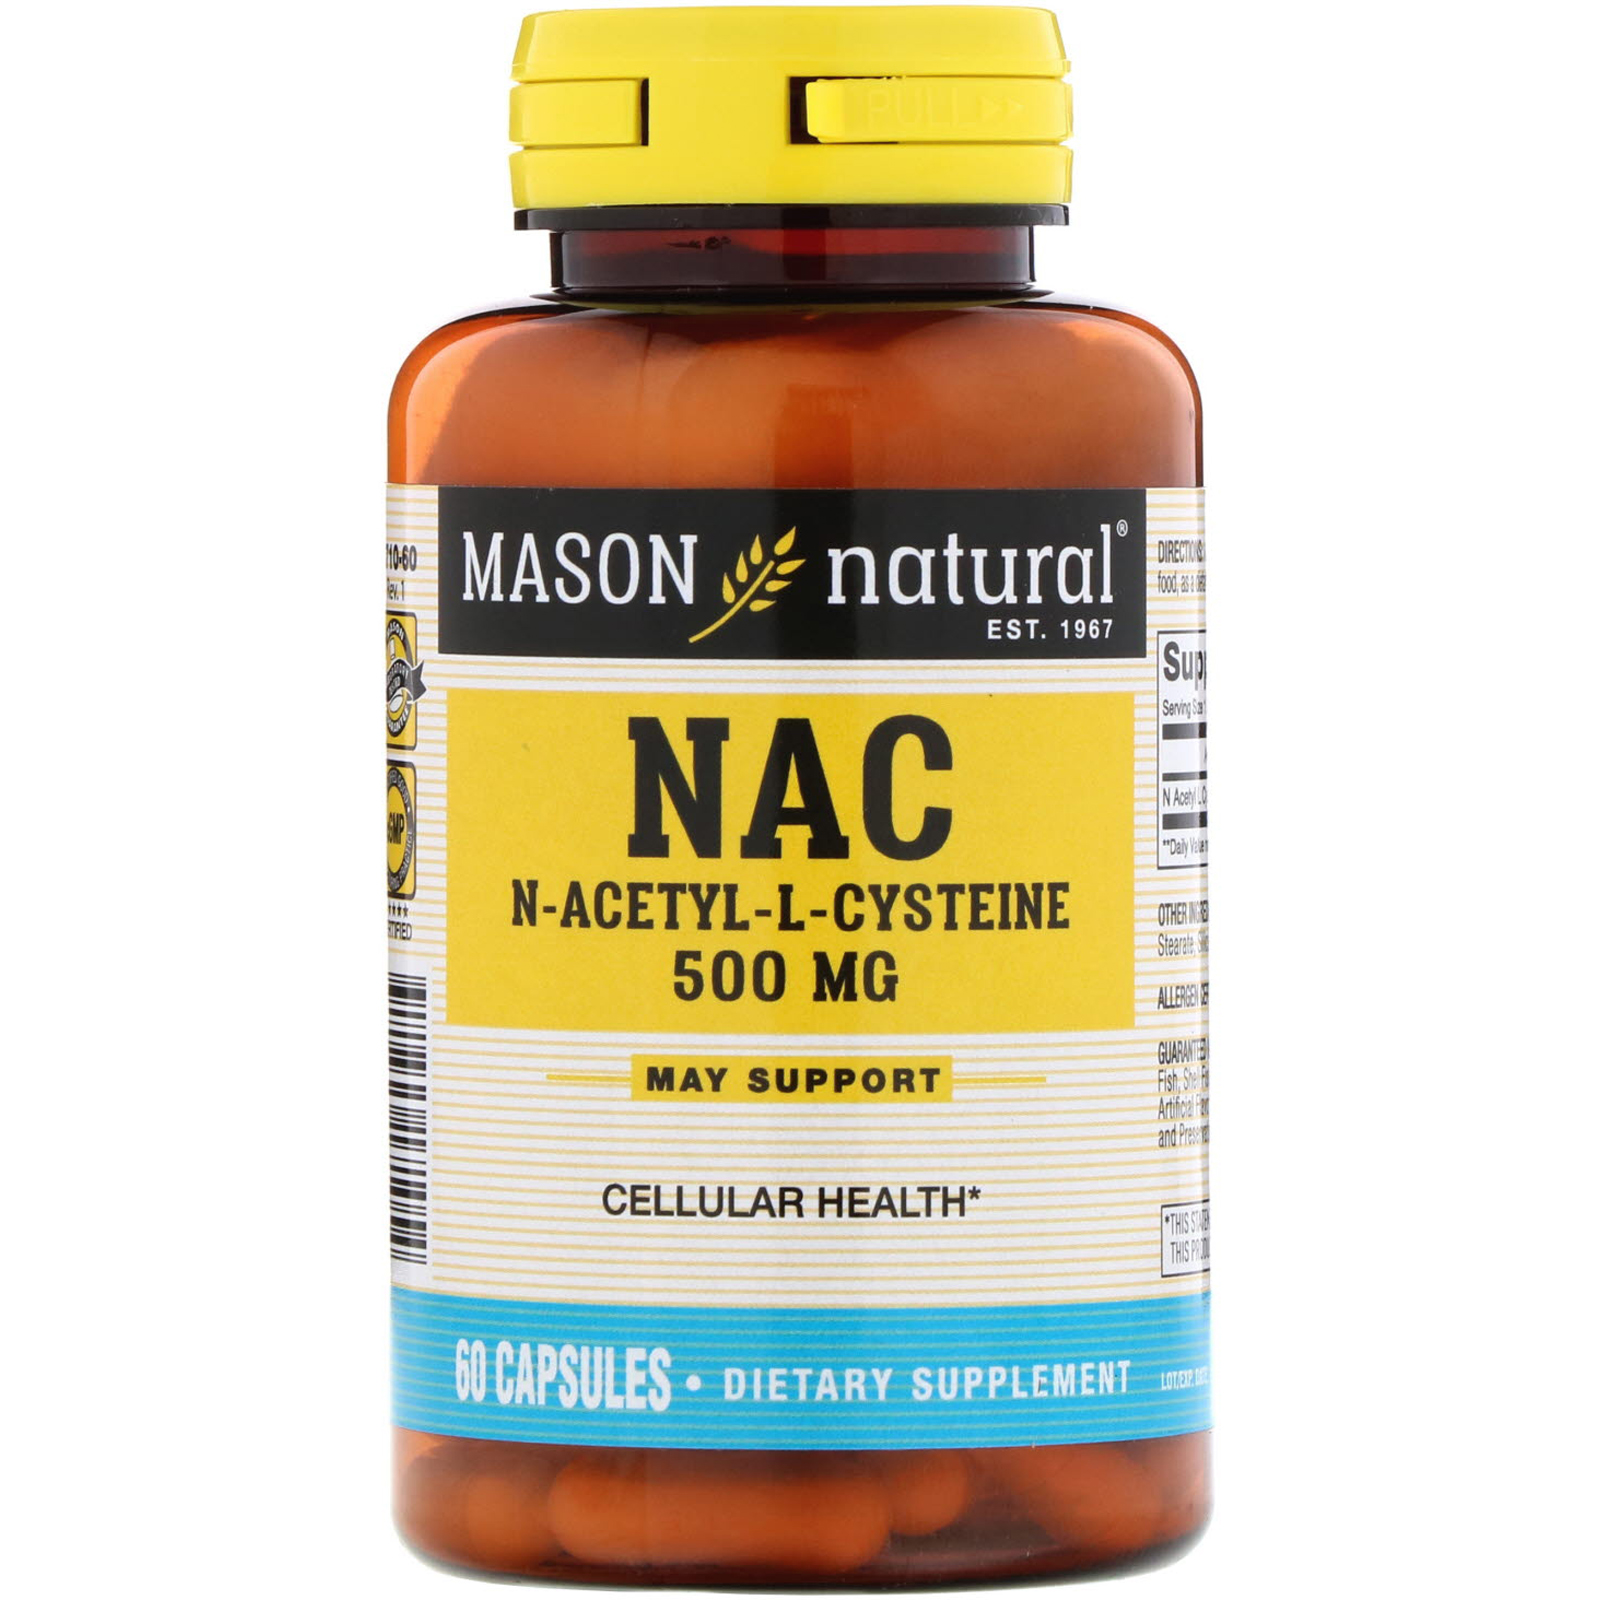 Mason Natural, NAC N-Acethyl-L-Cysteine, 500 mg, 60 Capsules - iHerb com